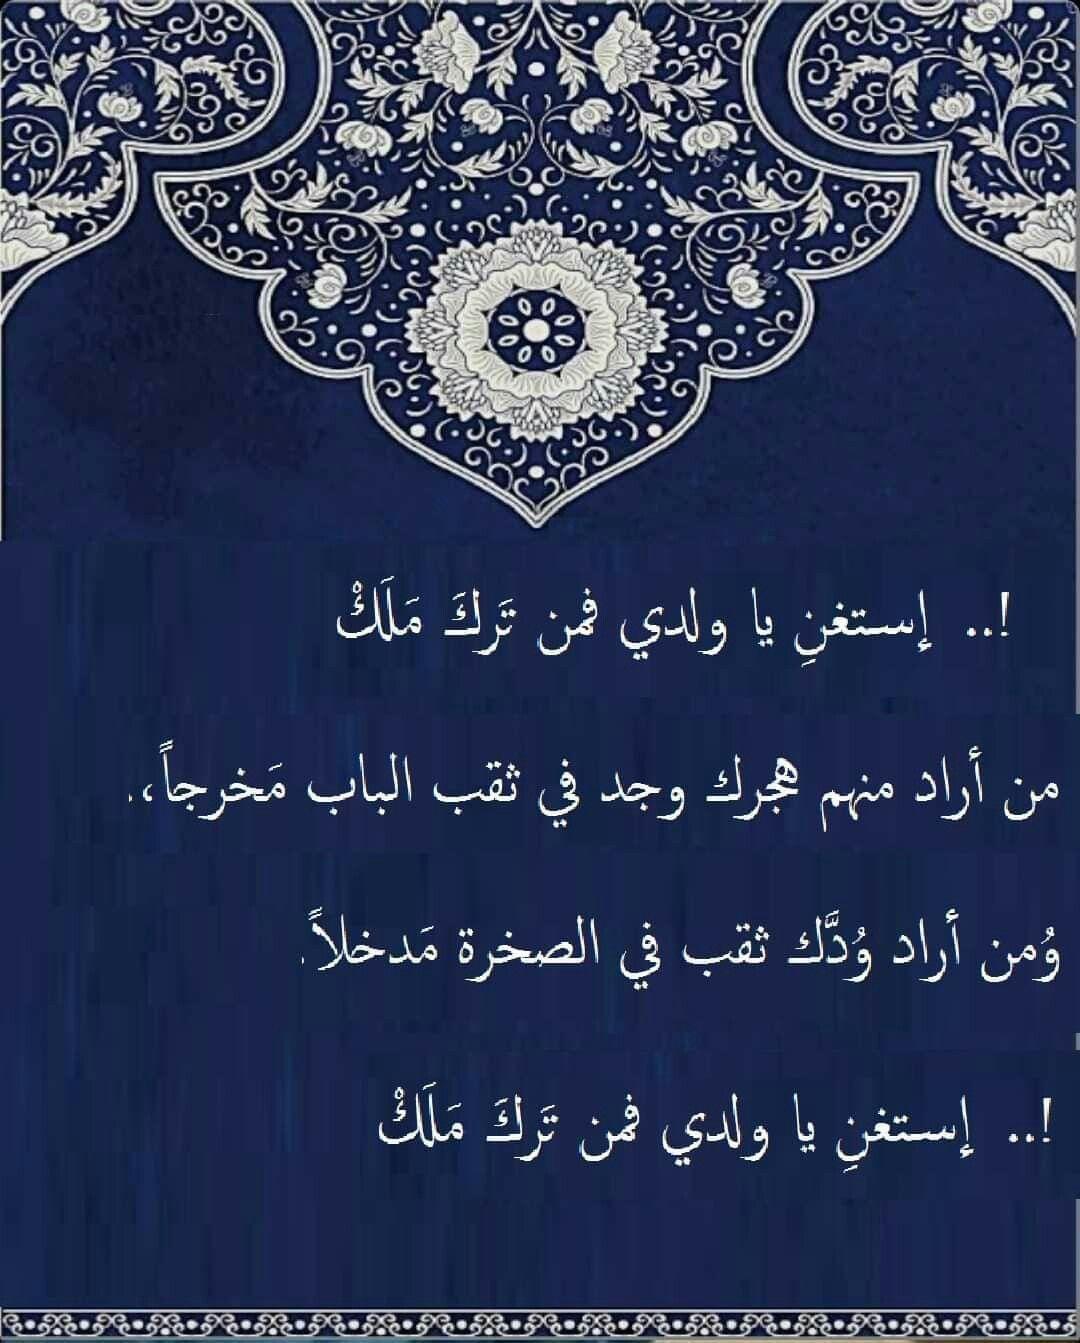 Pin By Riadh On عشق الكلام عن كلام العشق Calligraphy Arabic Calligraphy Art